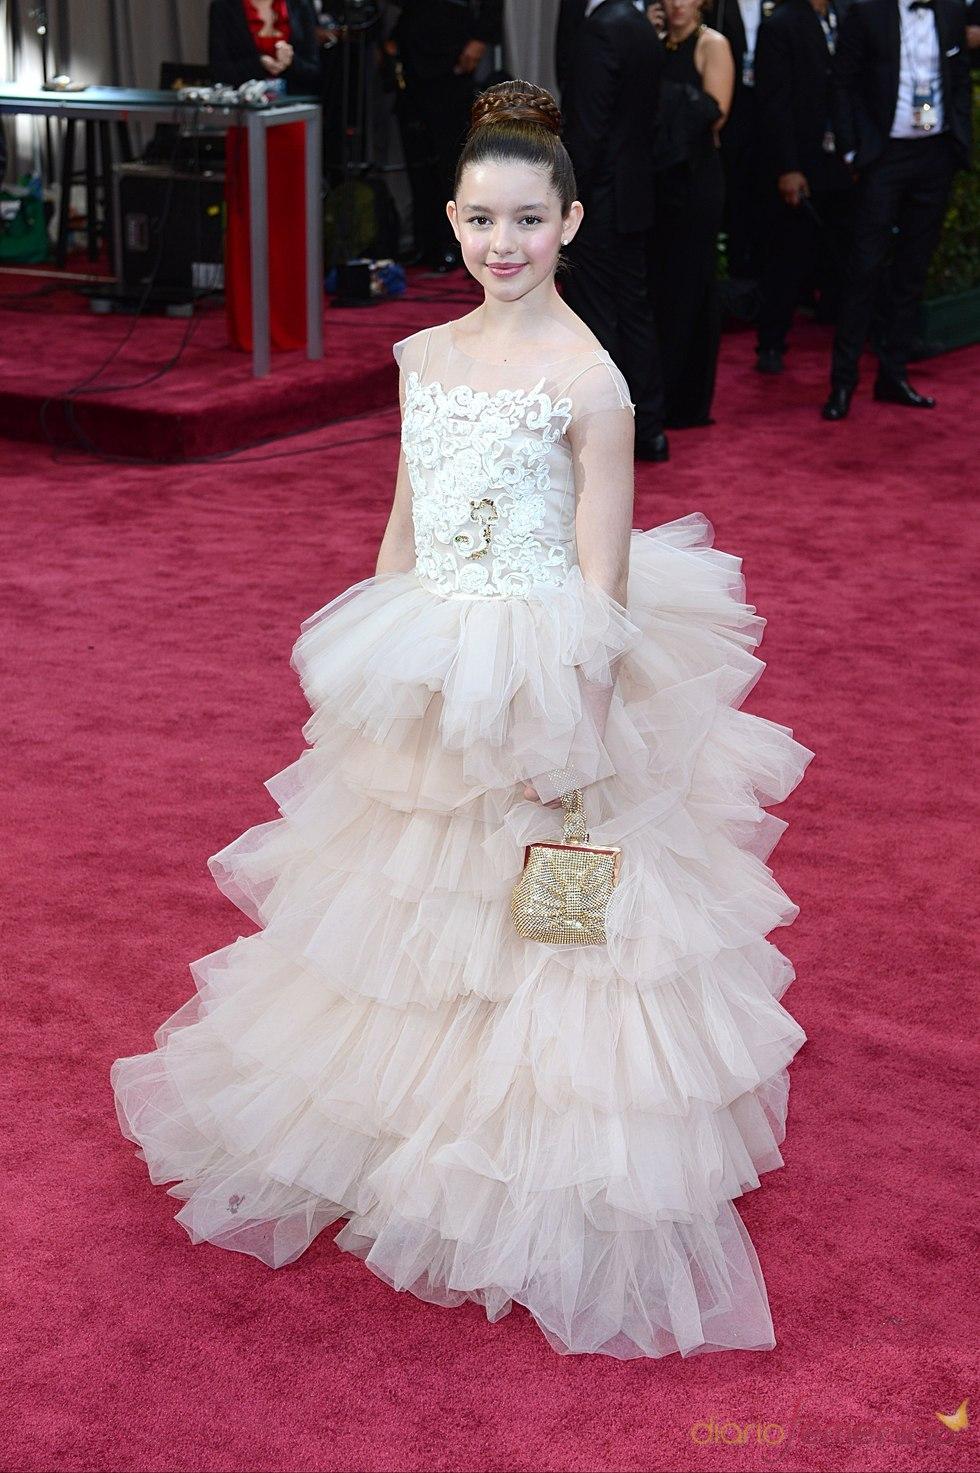 Fatima Ptacek en la alfombra roja de los Oscars 2013